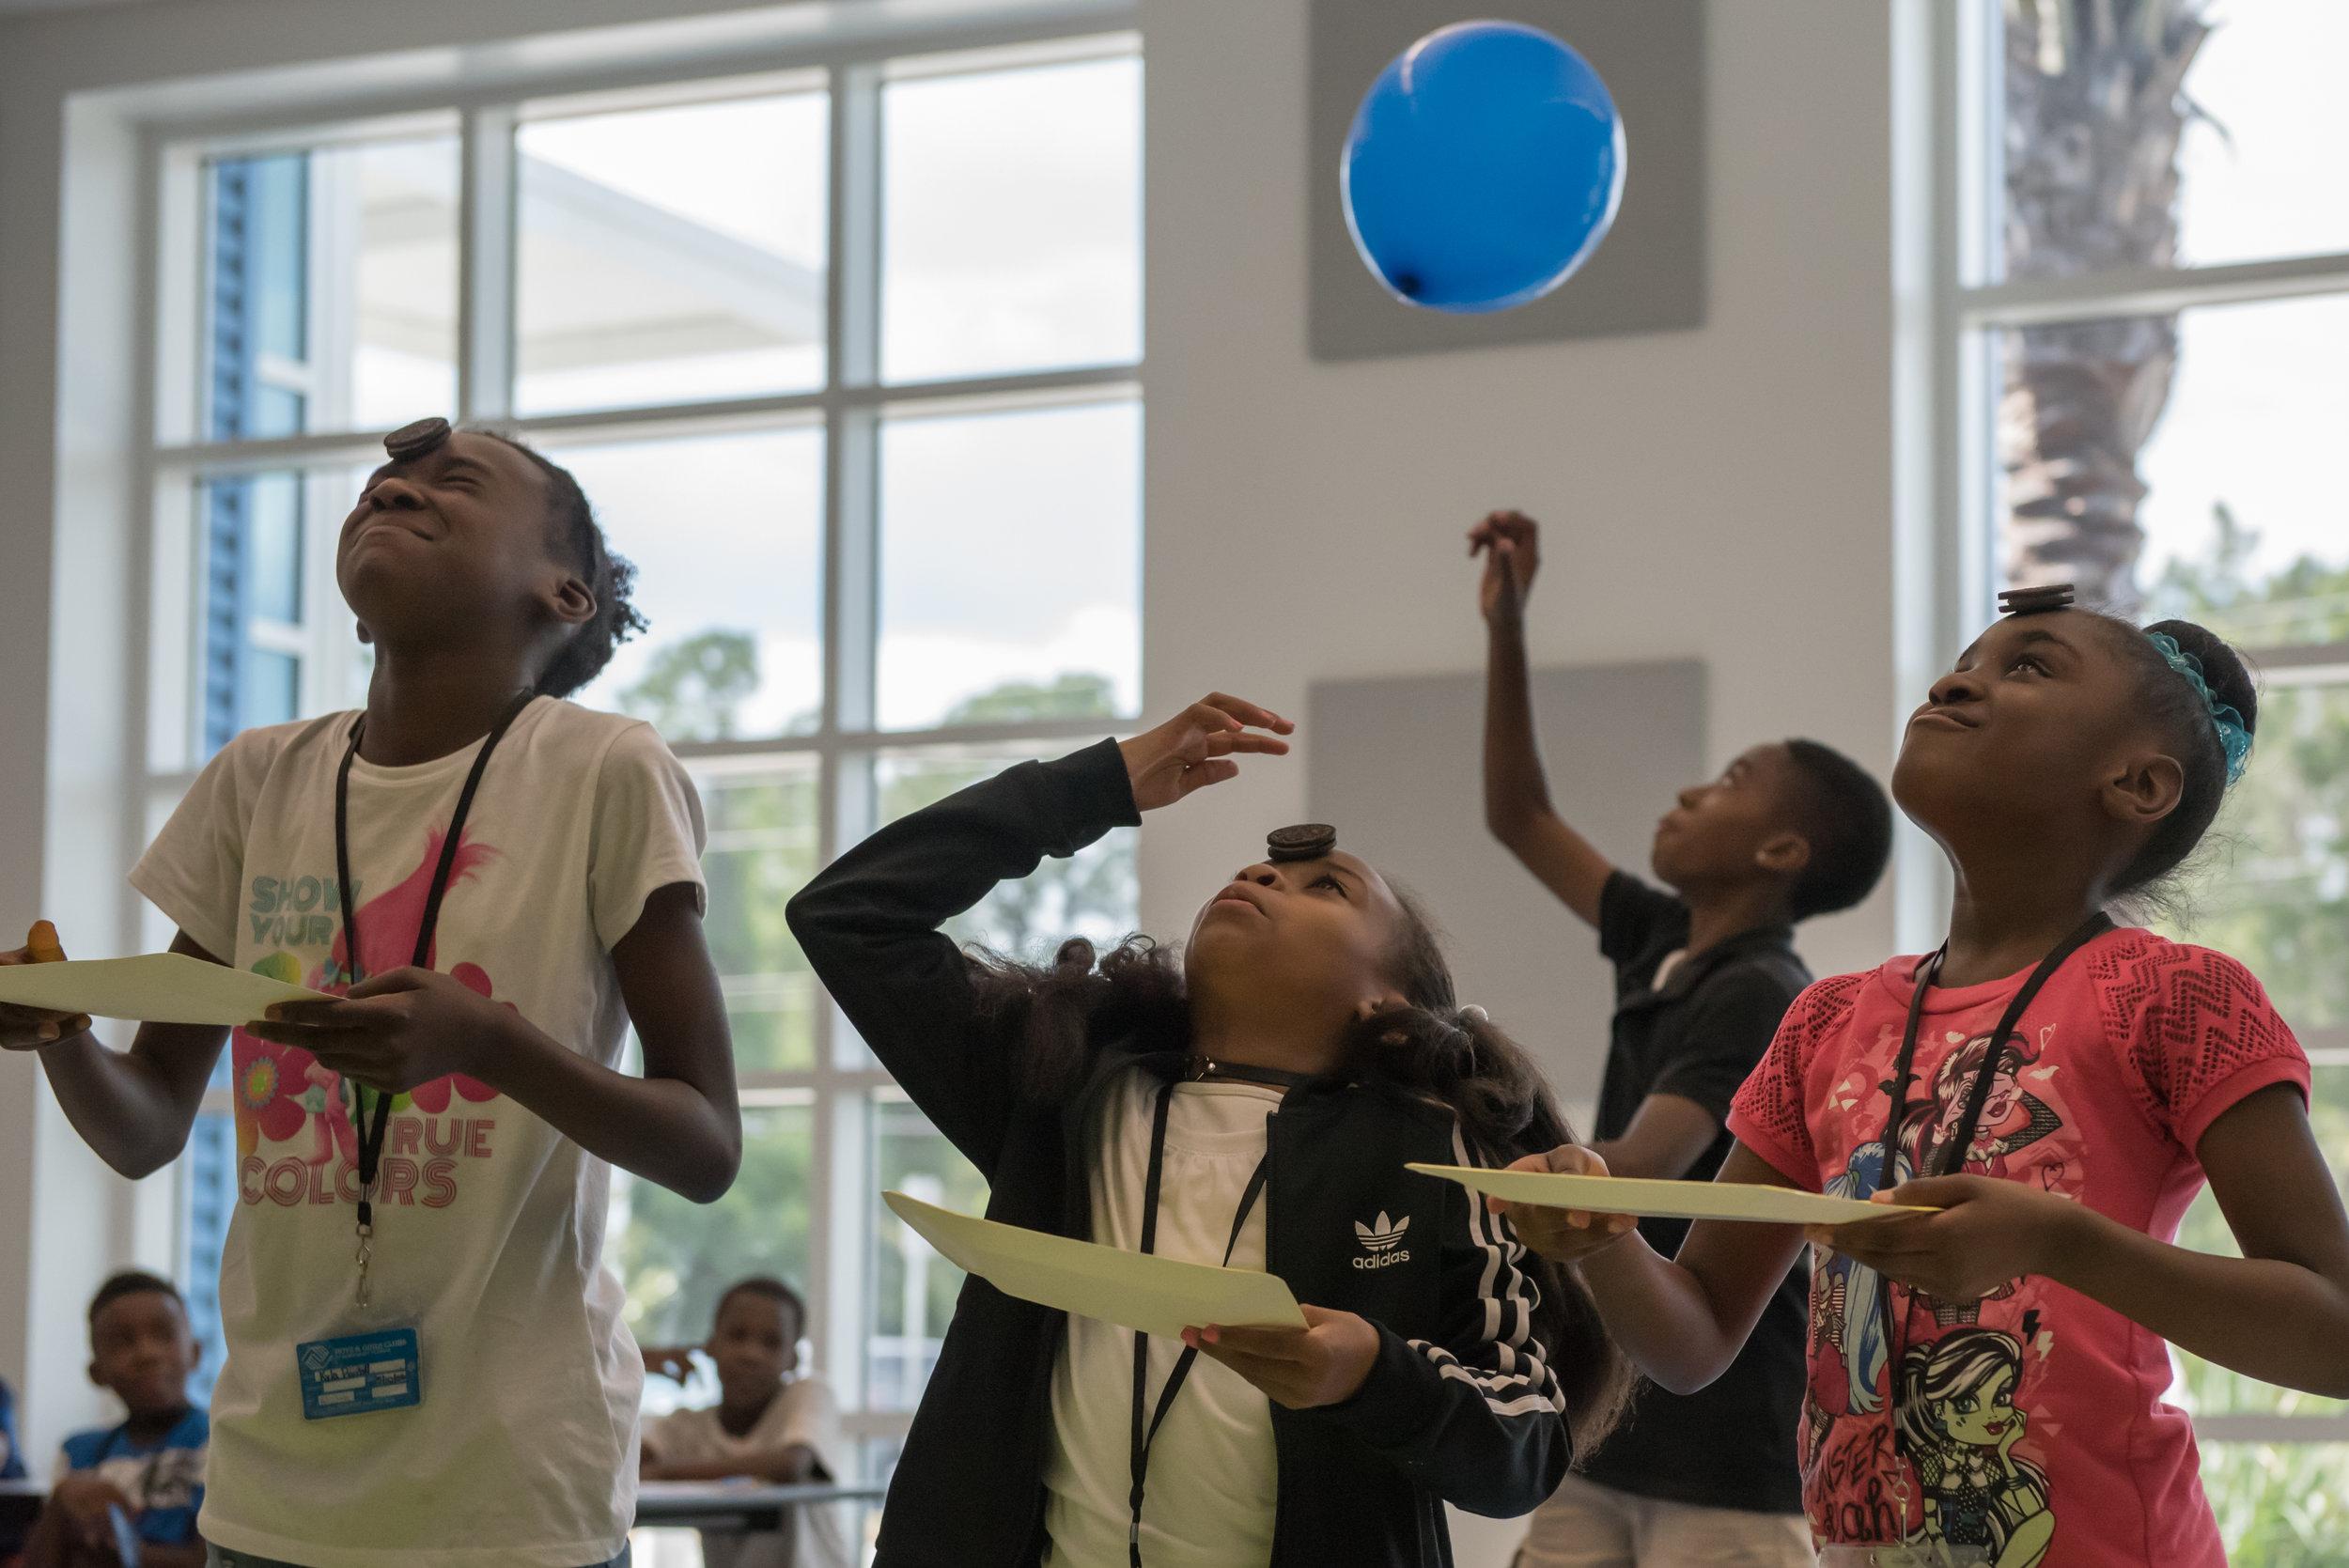 2017: Arlington Community Academy Celebratates Boys & Girls Club Week